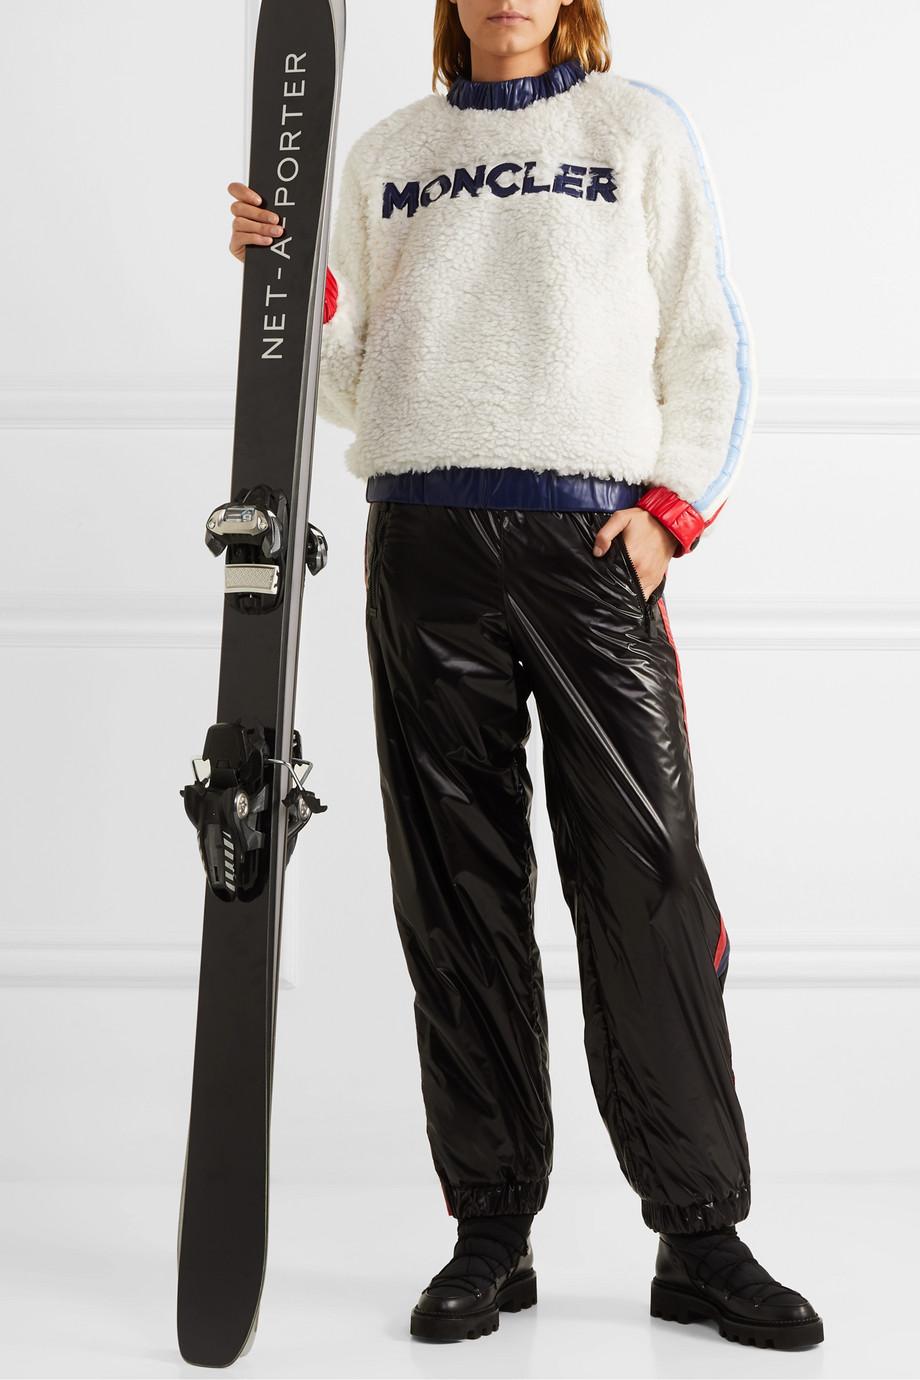 Moncler Grenoble 软壳面料边饰贴花人造羊毛皮毛衣